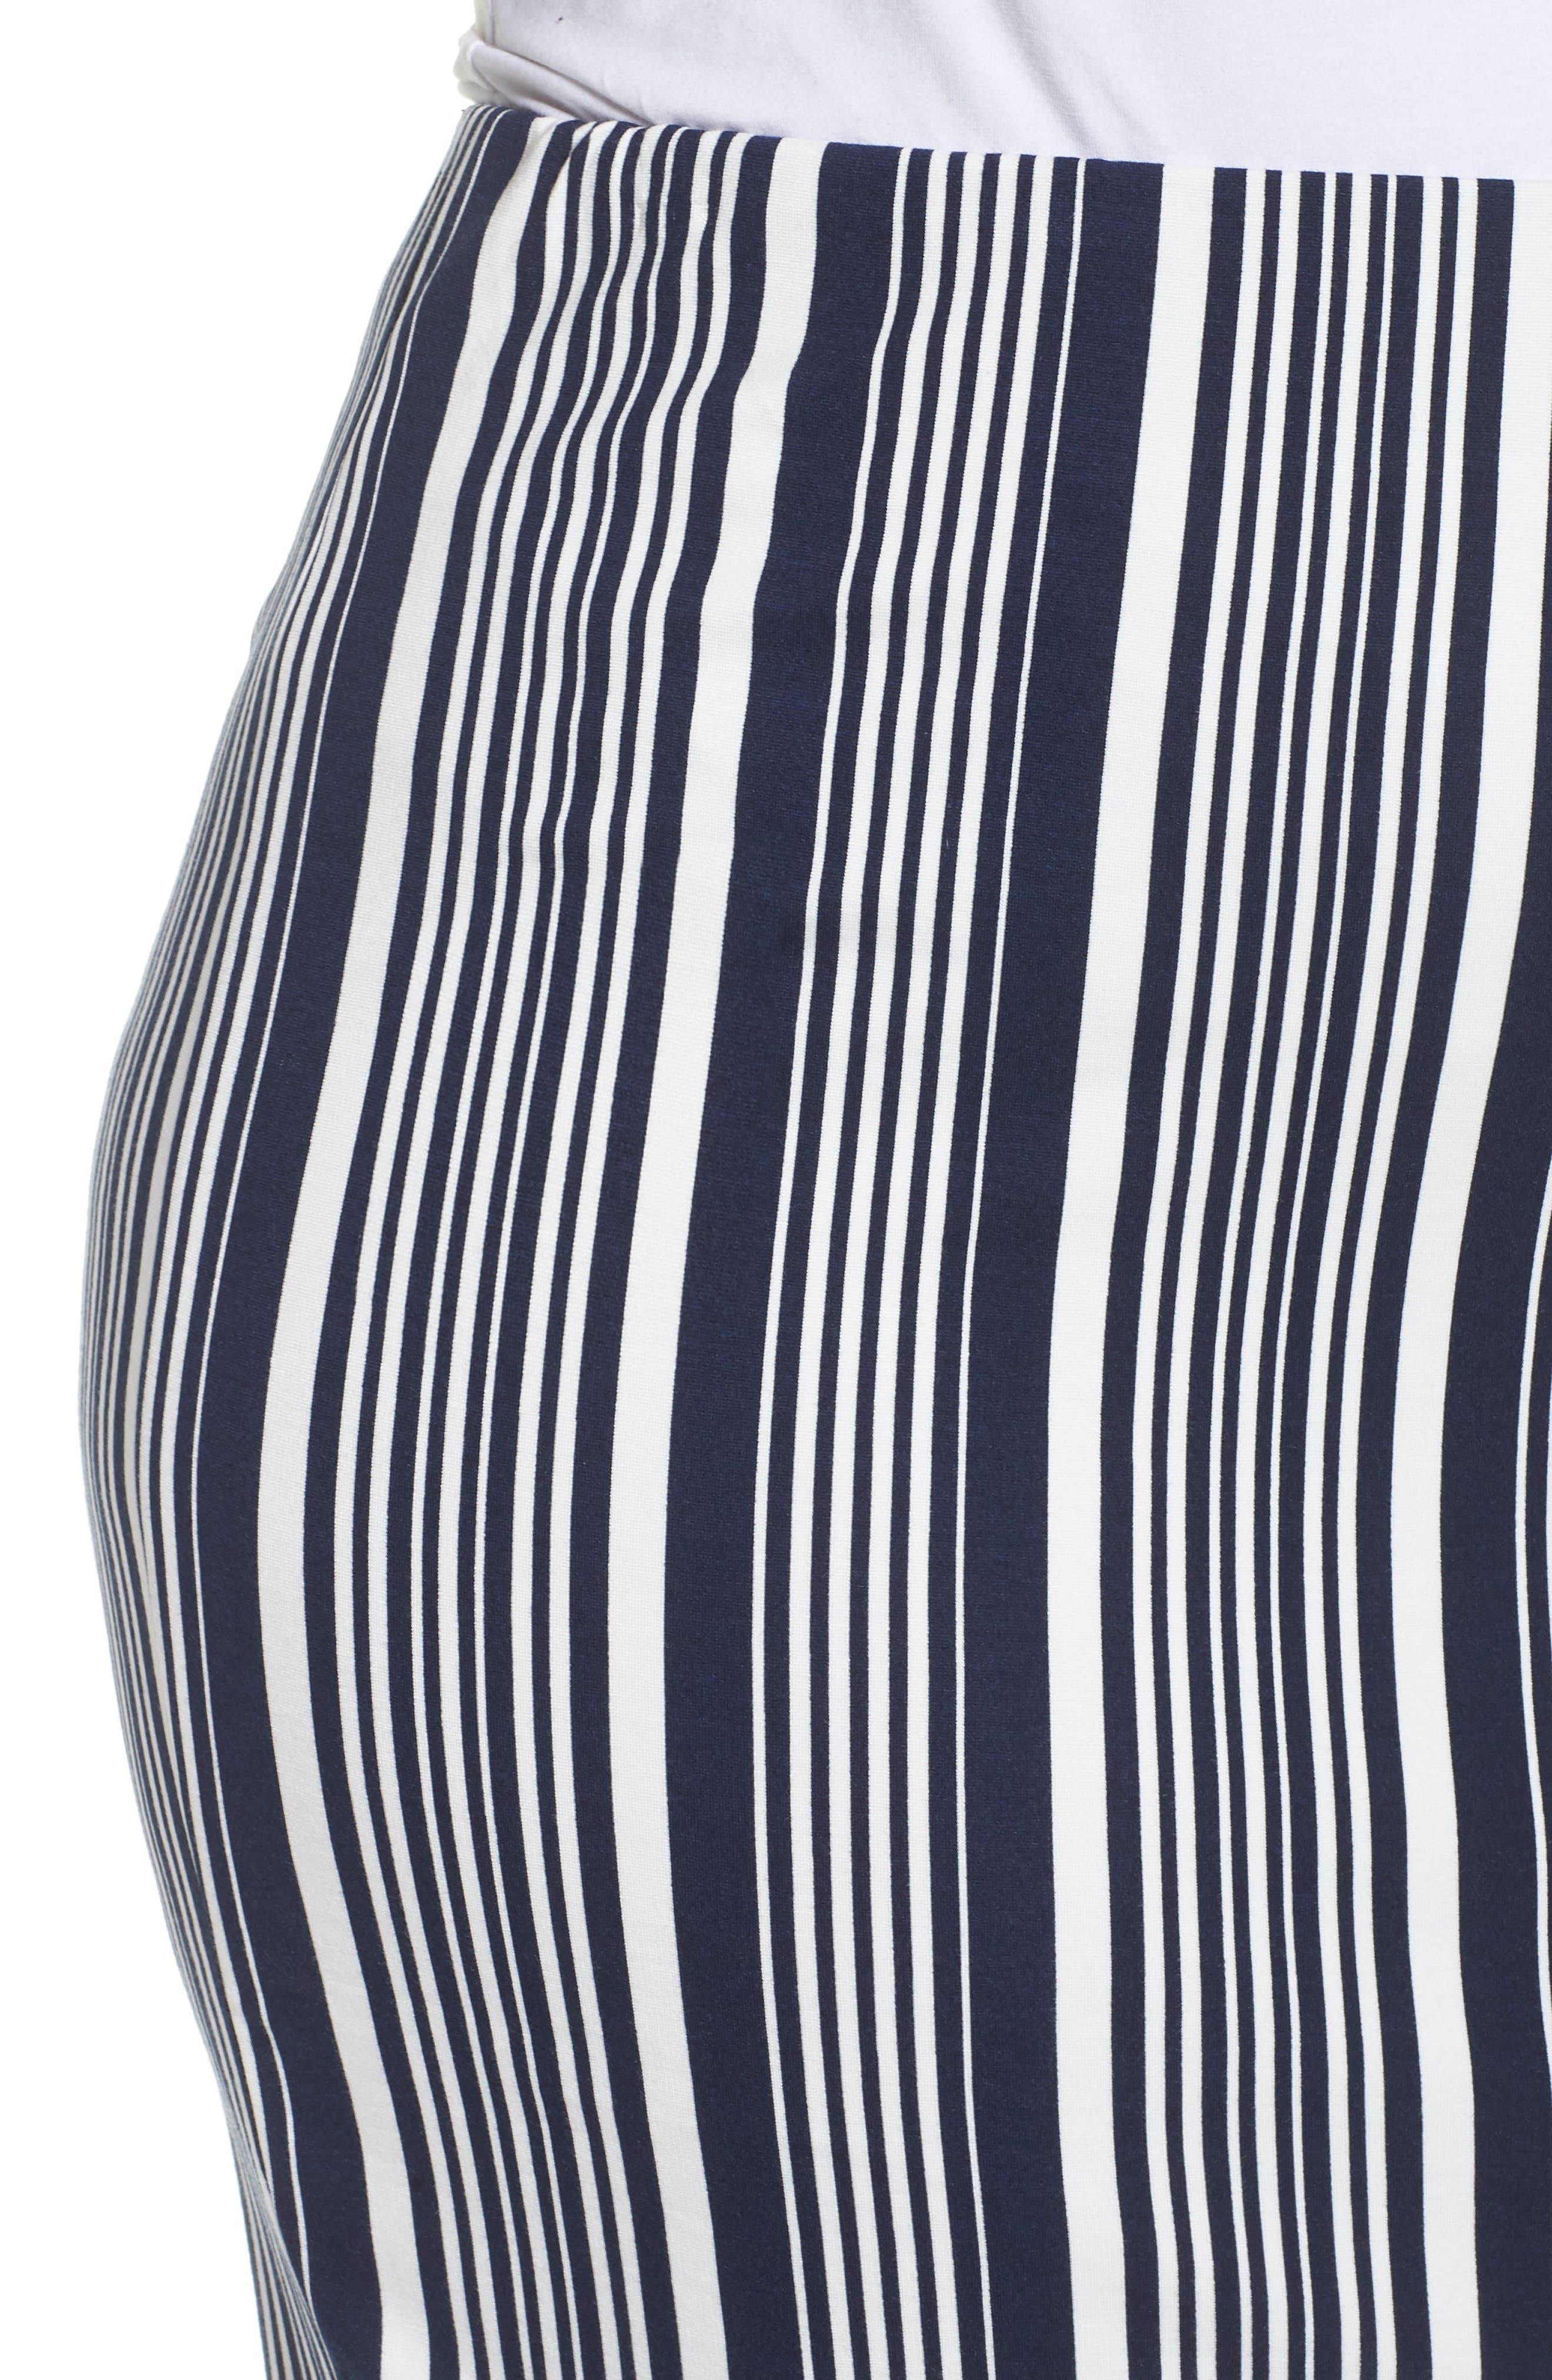 Stripe Ponte Pencil Skirt,                             Alternate thumbnail 4, color,                             Navy Alexis Stripe